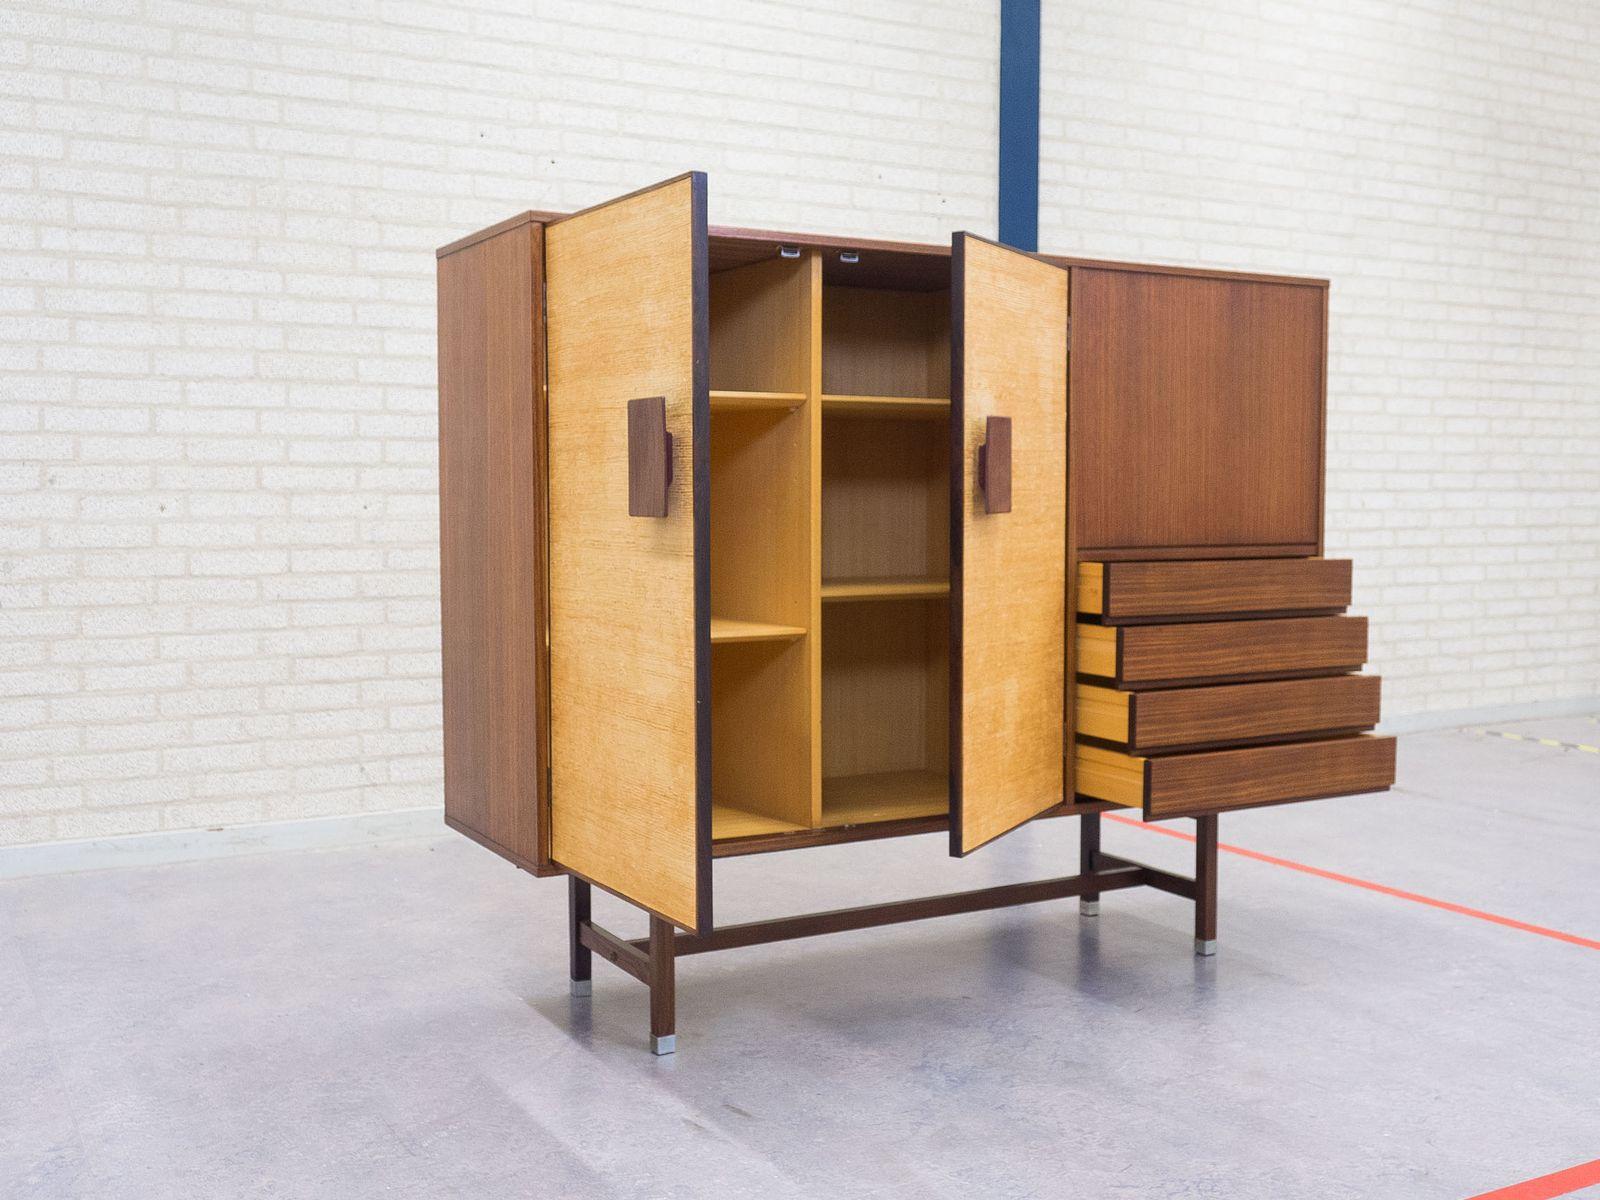 Mid Century Inger 150 Cabinet By Inger Klingenberg For